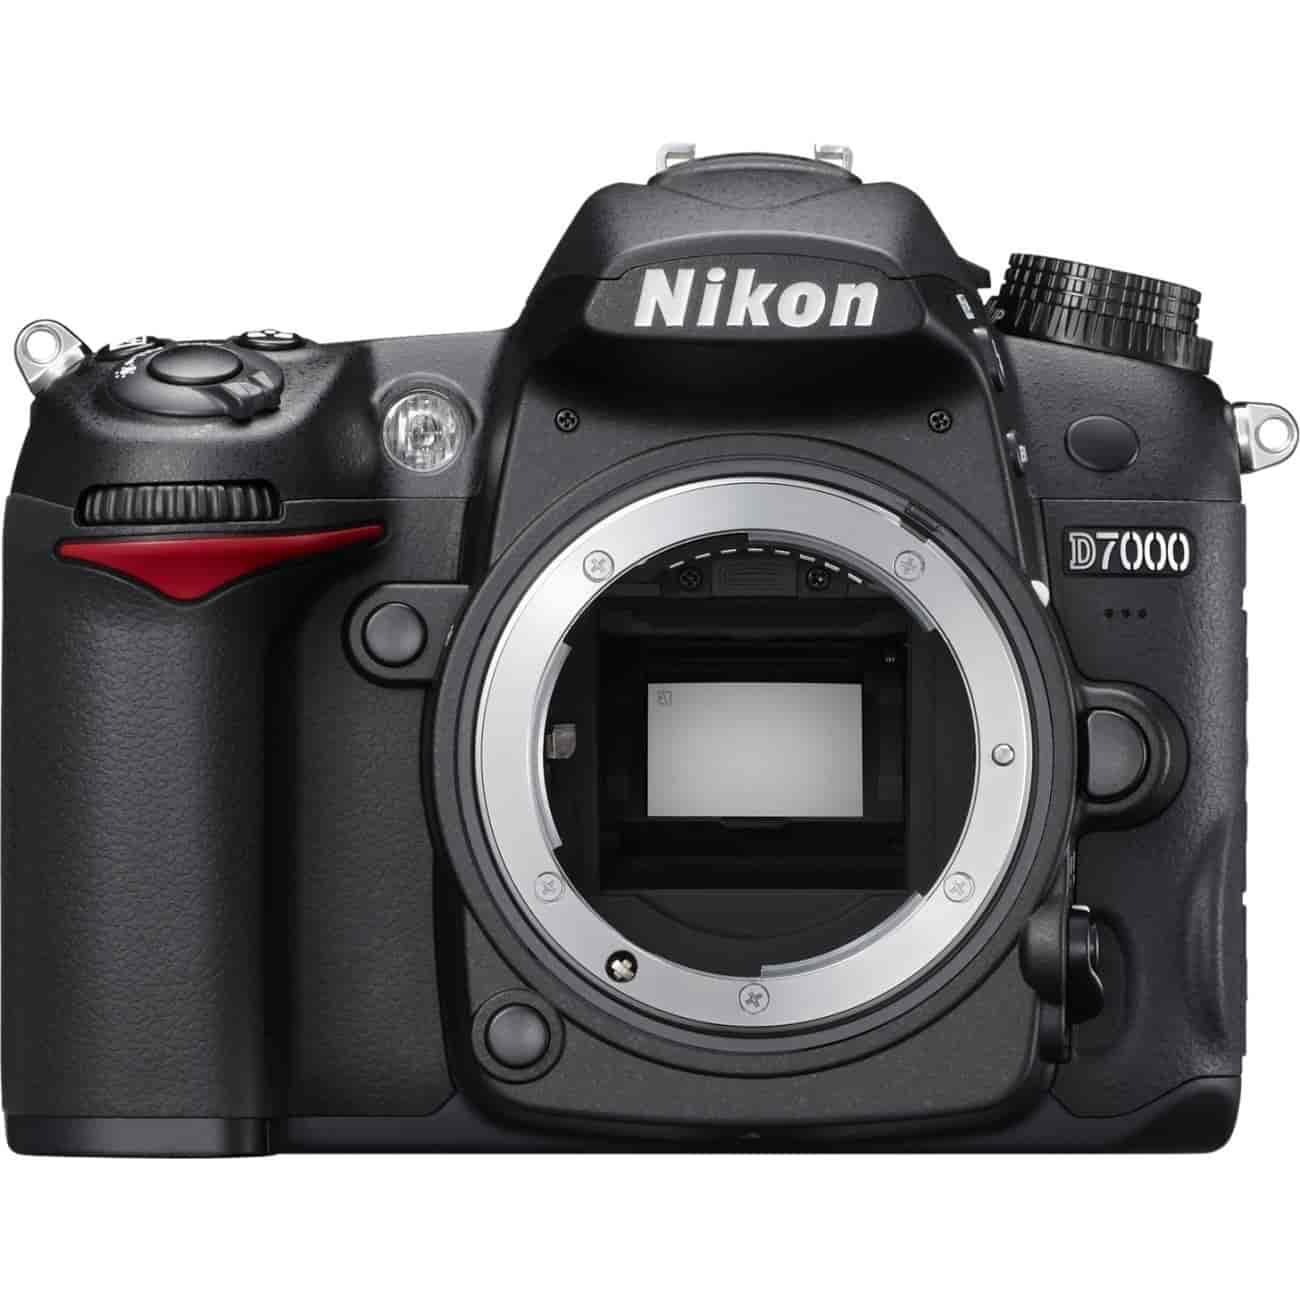 Camera Nikon D7000 16.2mp Dslr Camera buy nikon d7000 body only 16 2 mp dslr camera features price camera